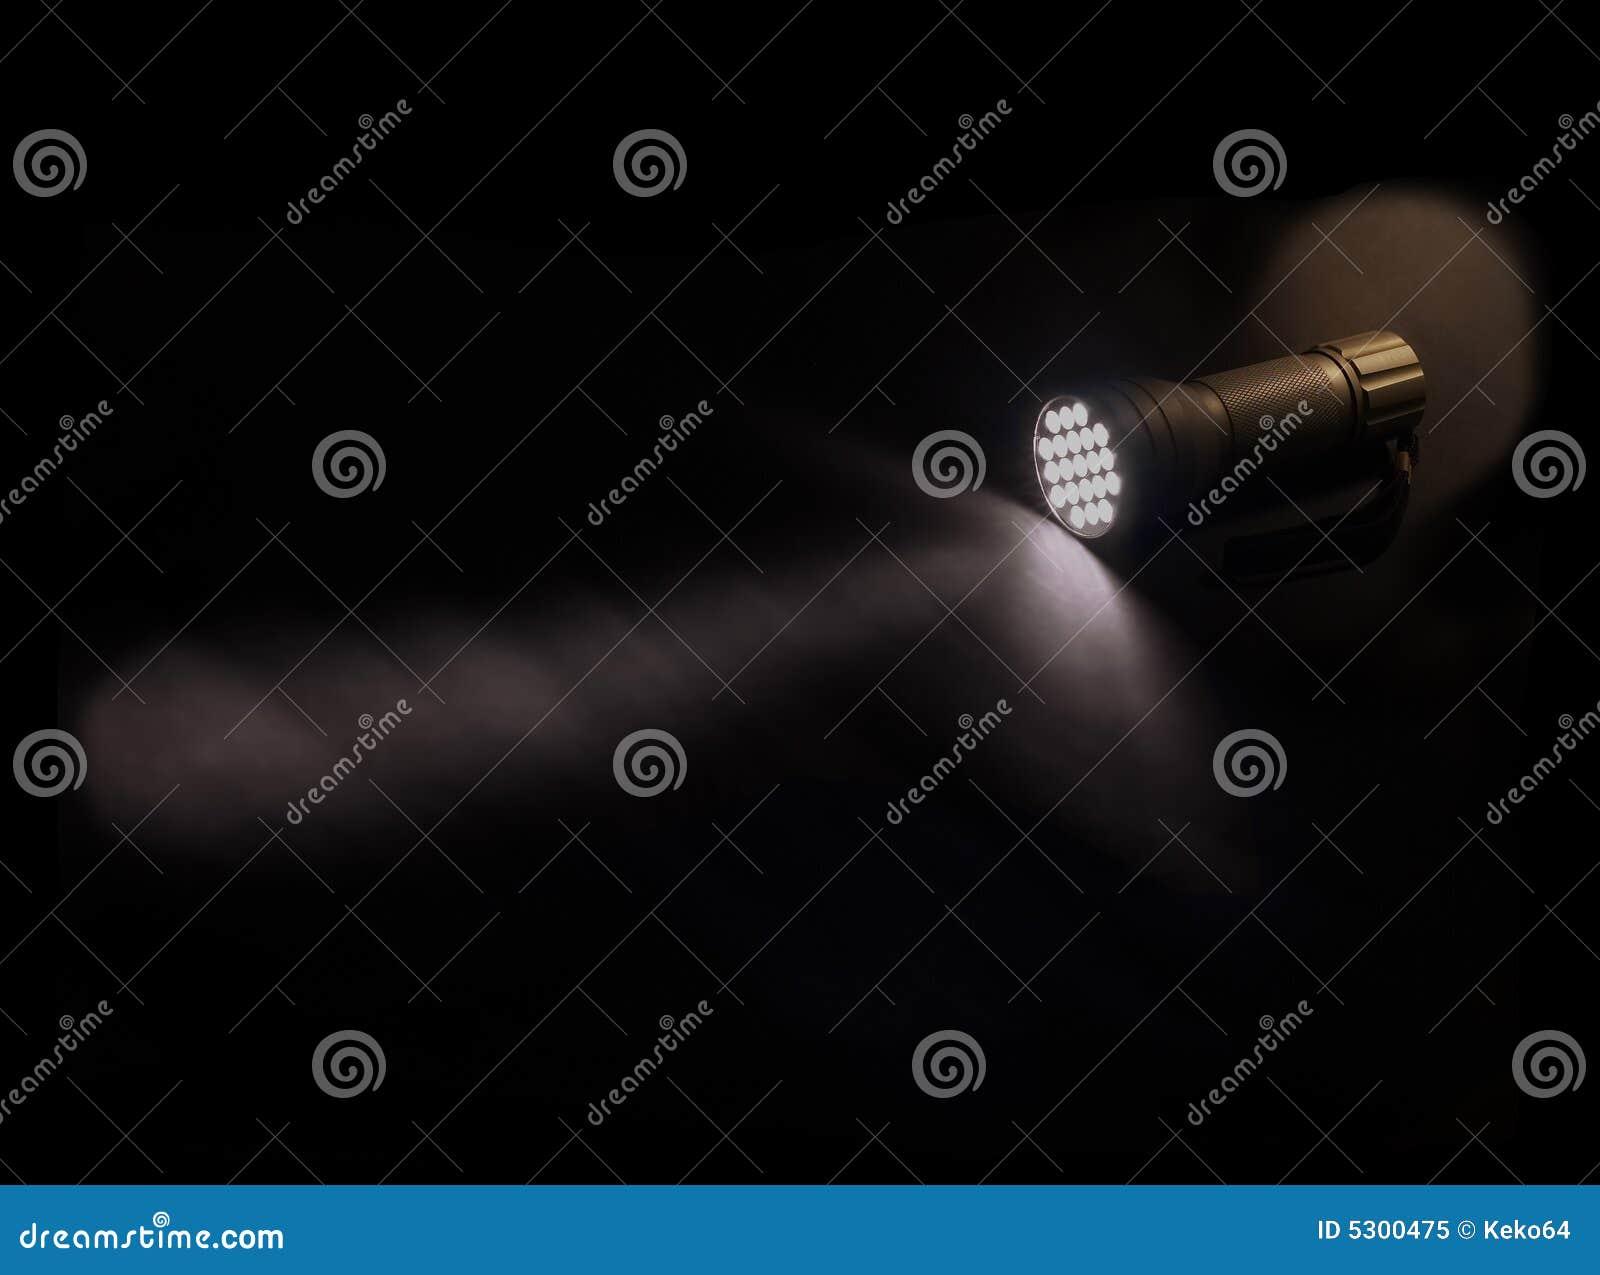 Download Torcia elettrica immagine stock. Immagine di emergenza - 5300475